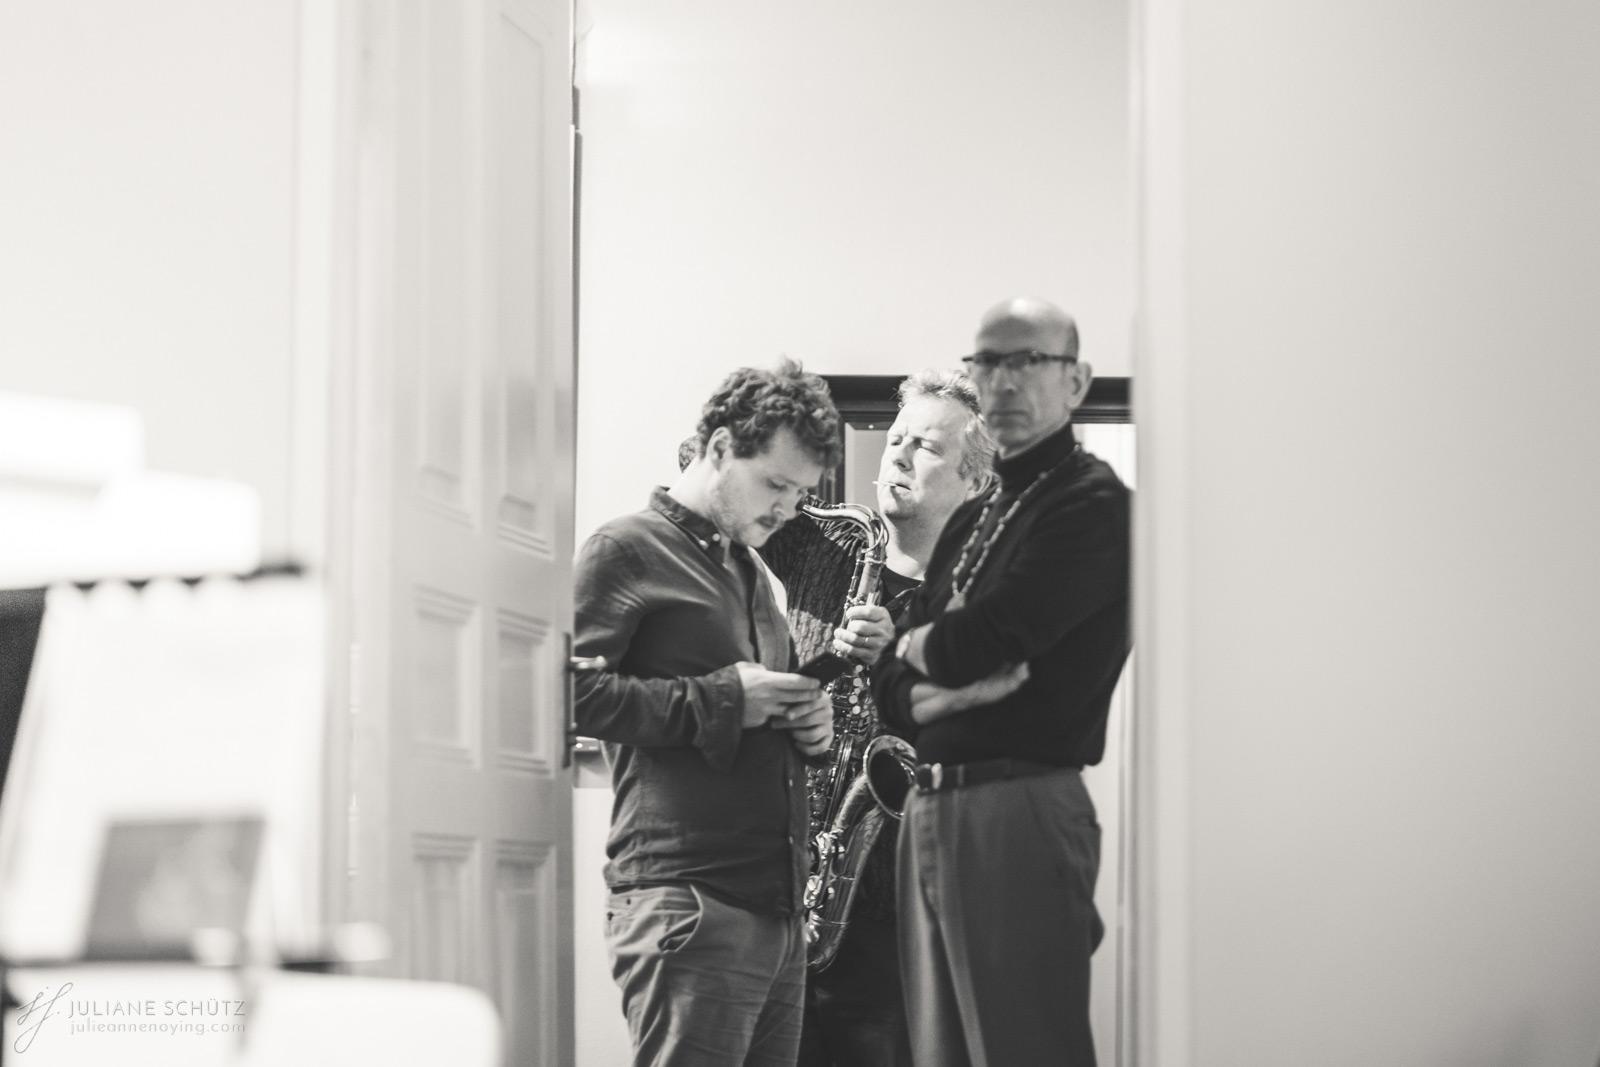 Bjørn Marius Hegge Trio & Fredrik Ljungkvist | © Juliane Schütz